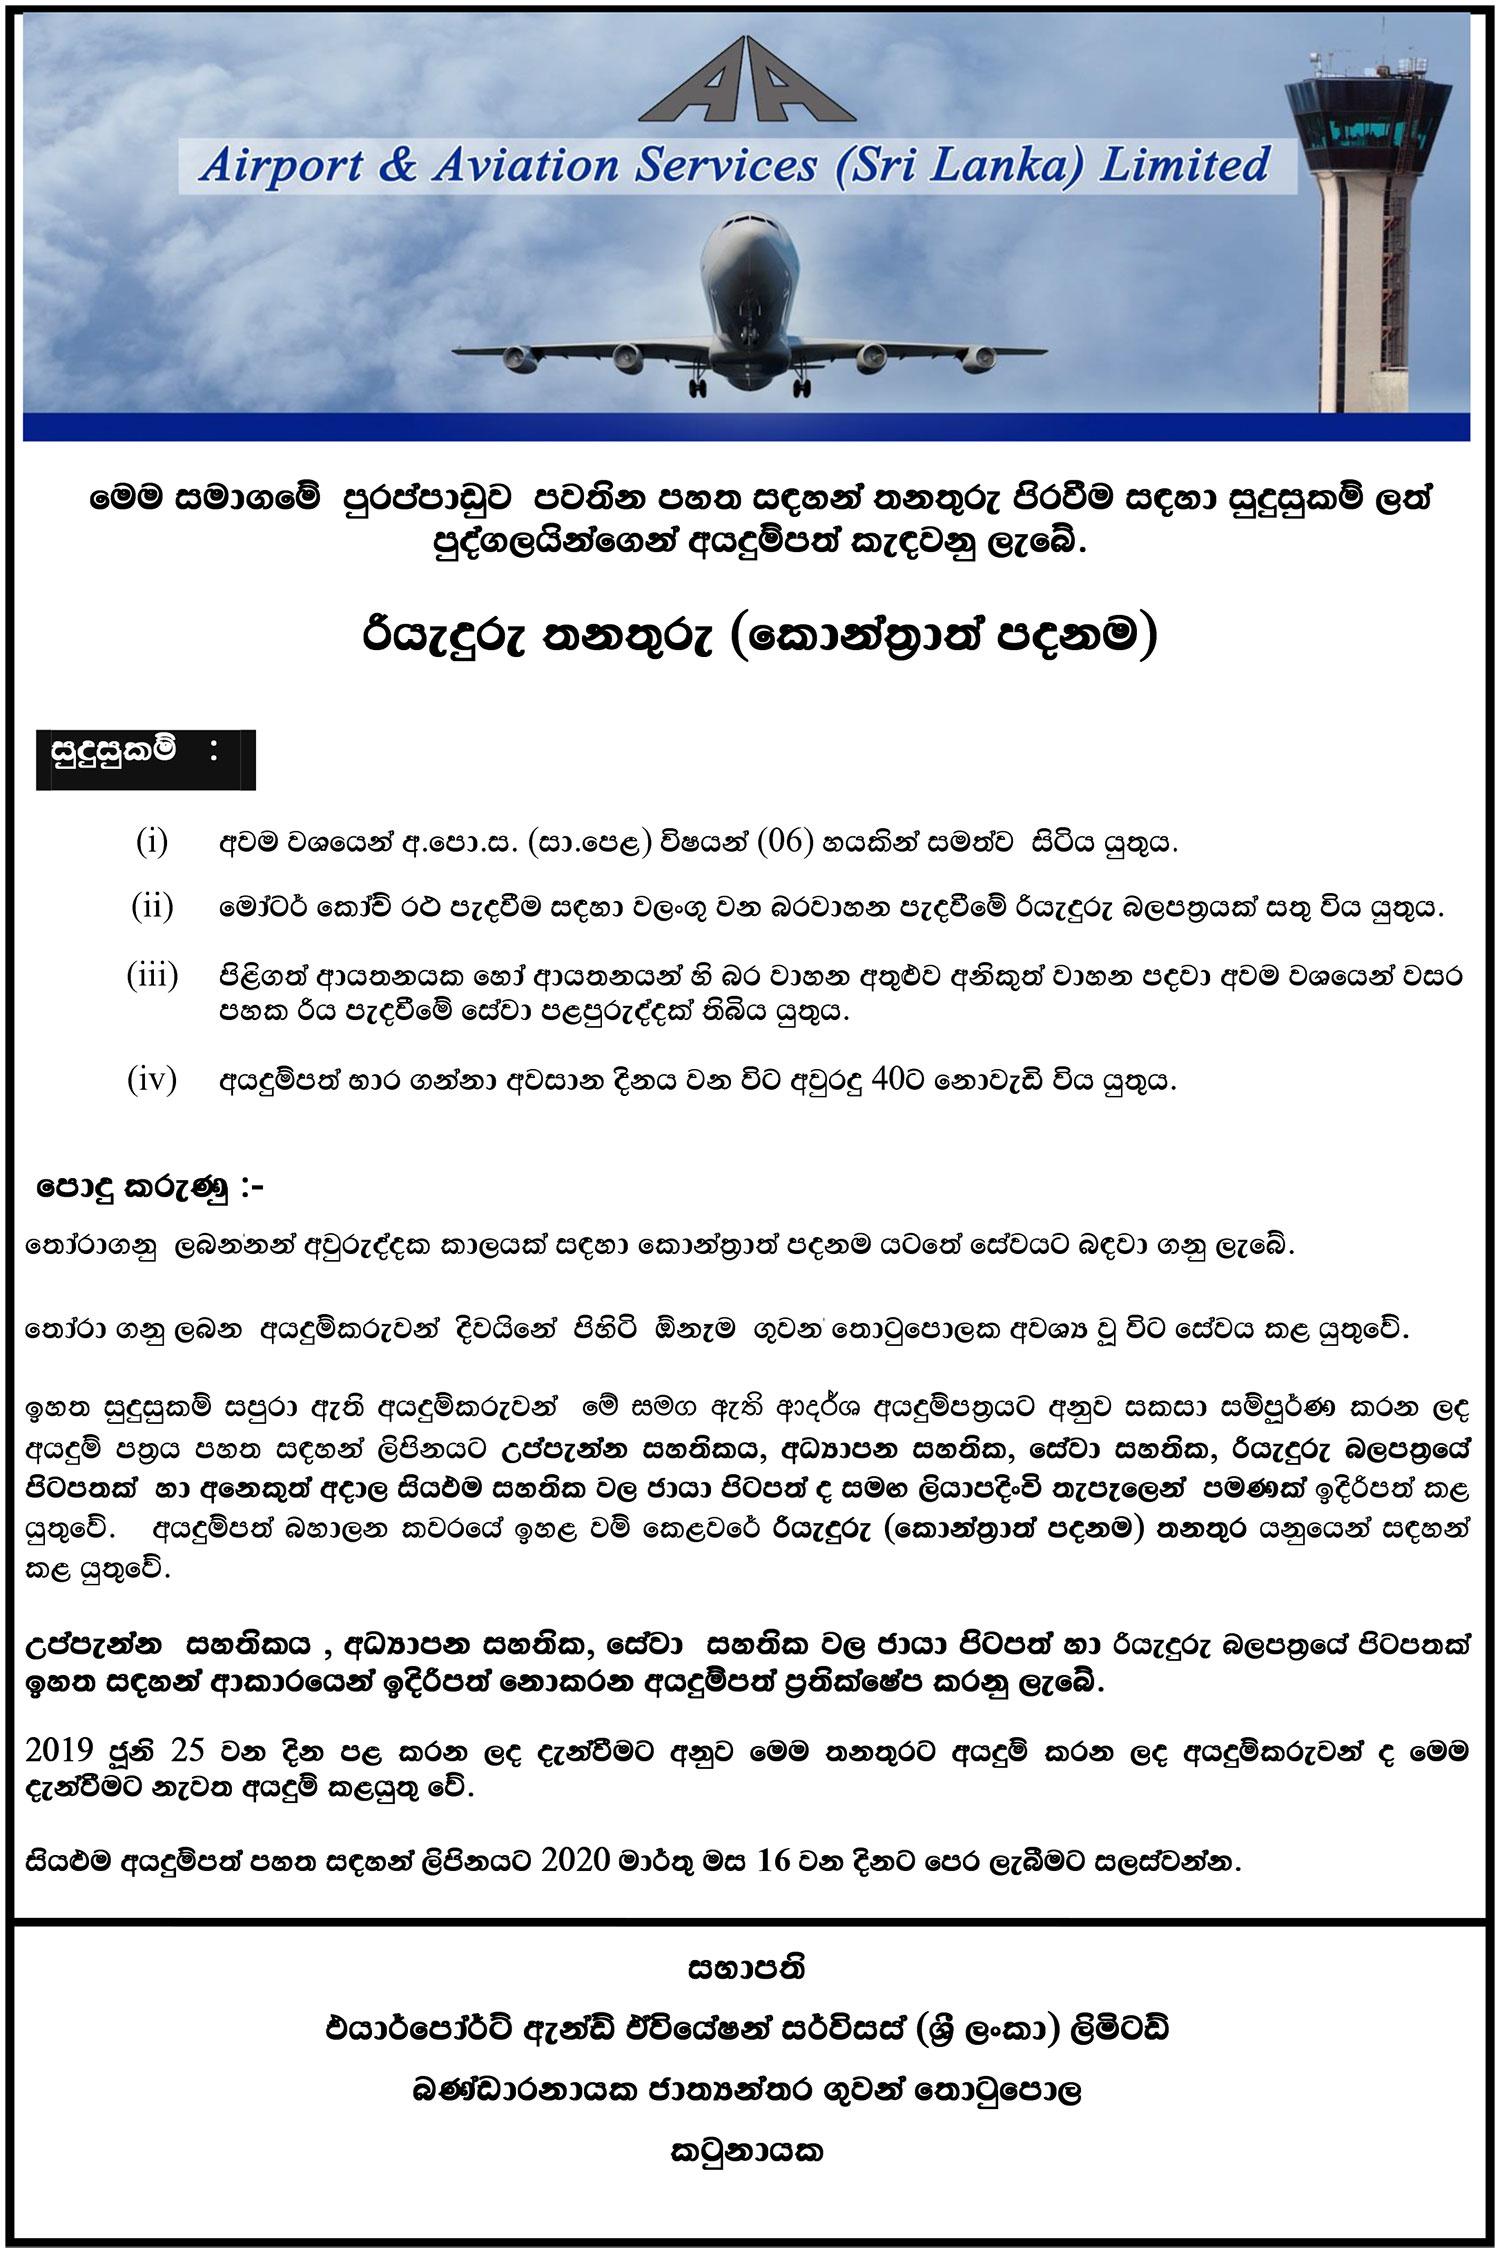 Driver - Airport & Aviation Services (Sri Lanka) Ltd